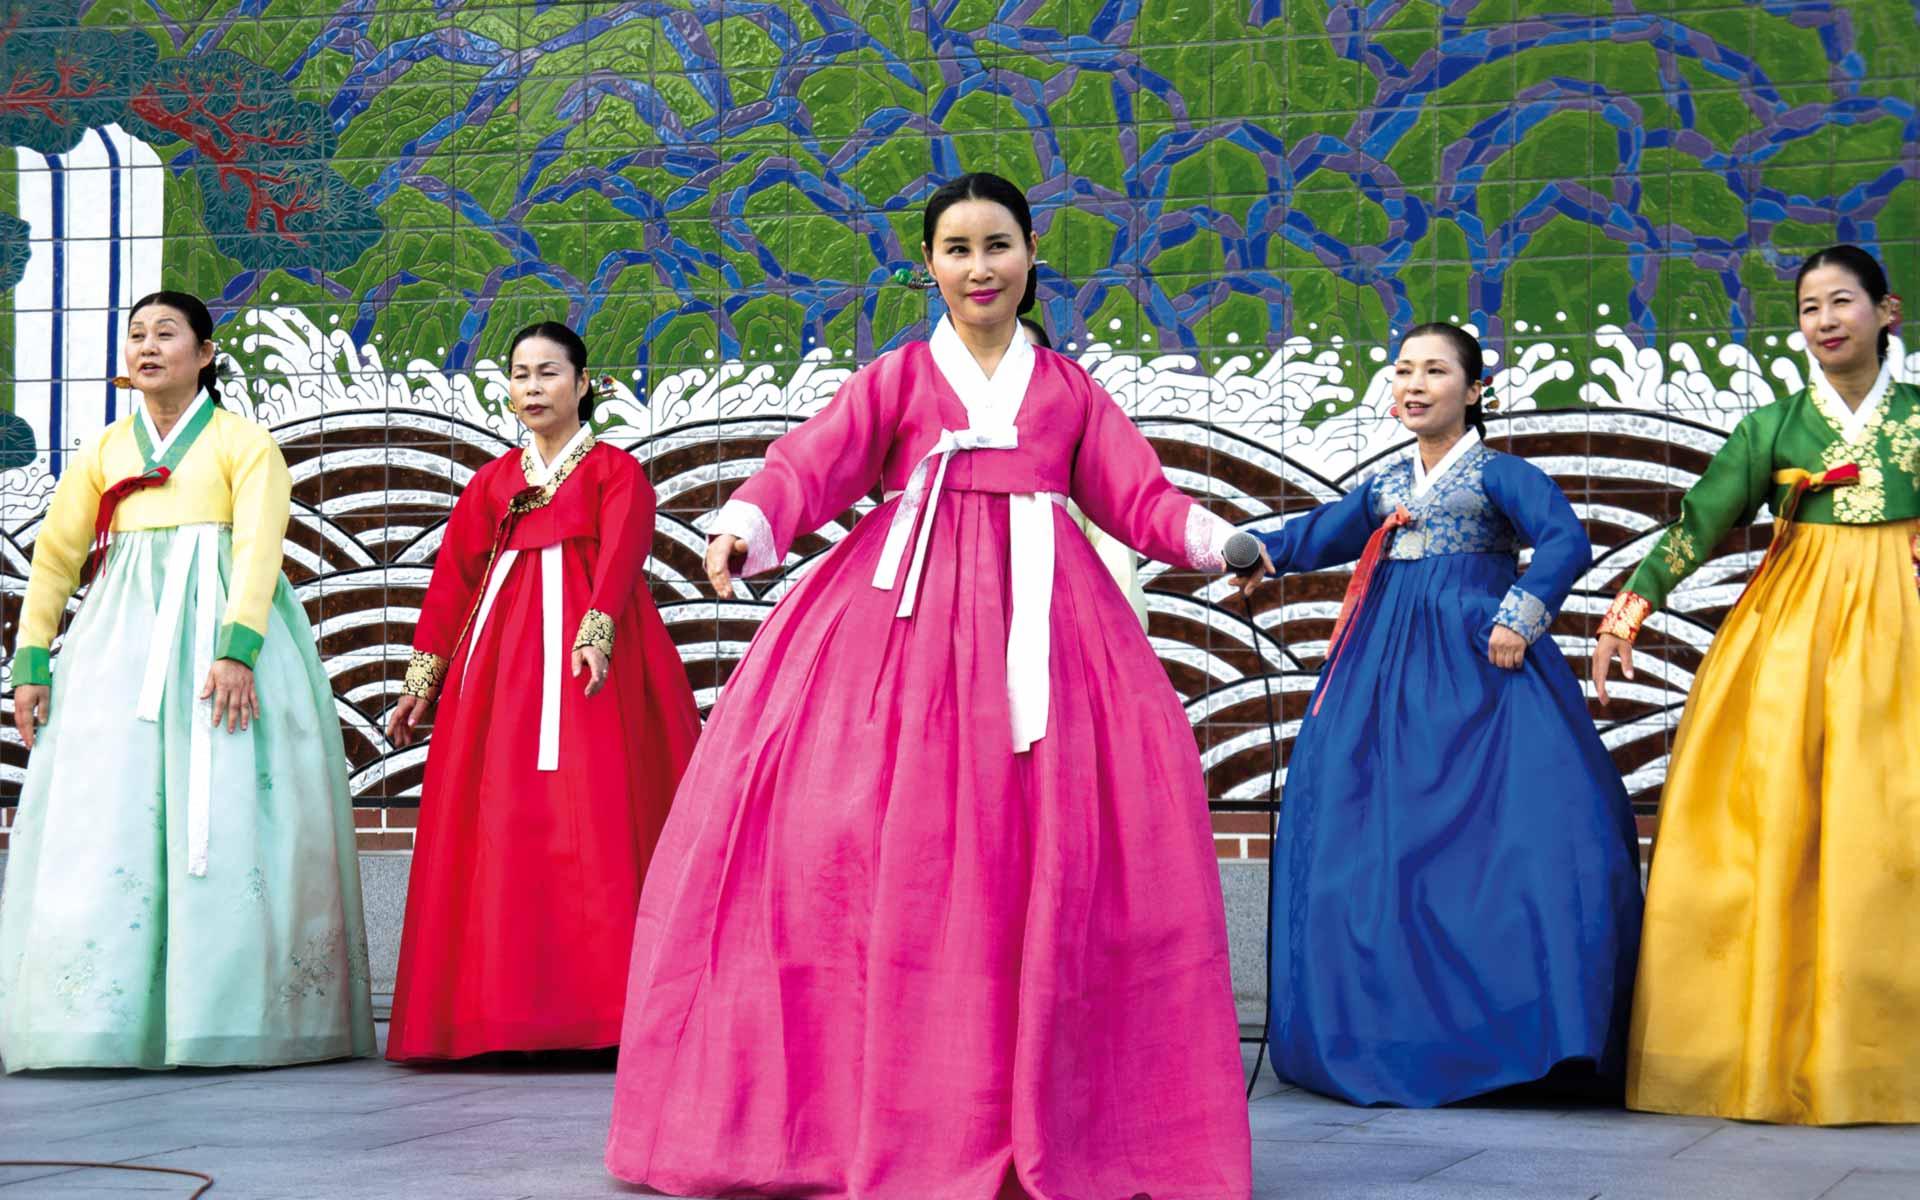 Das wahre Korea in 151 Momentaufnahmen